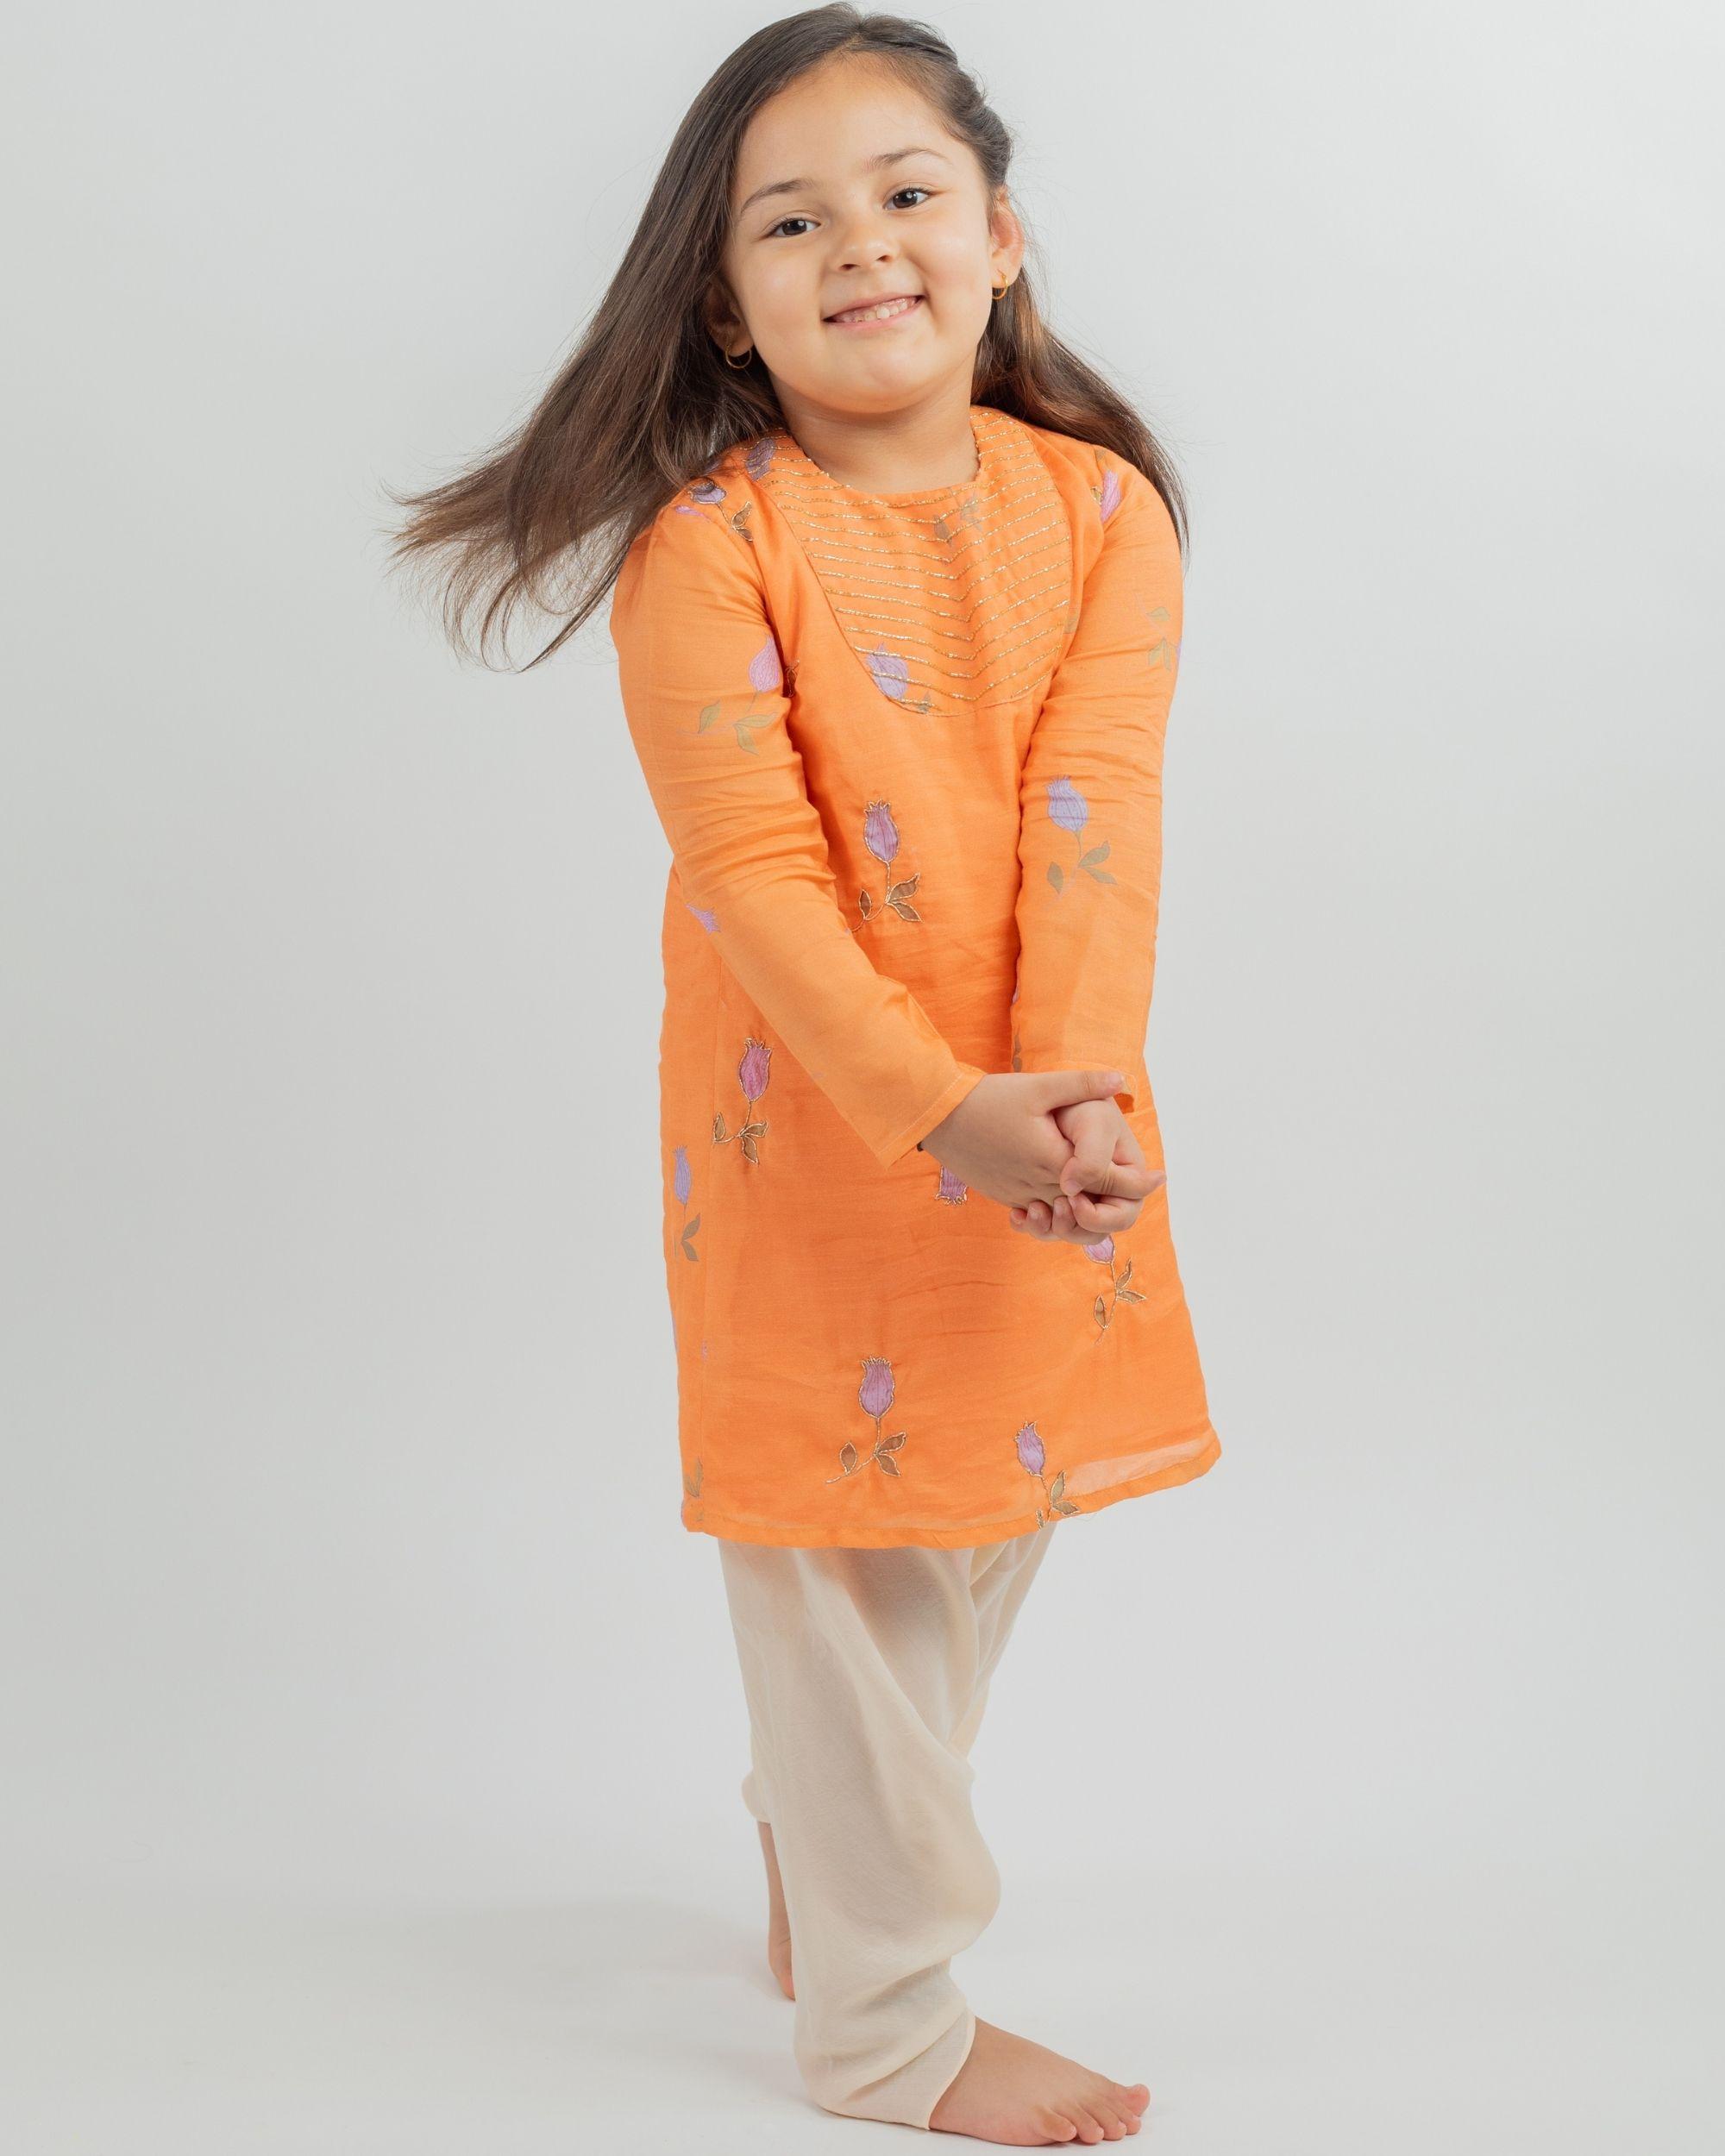 Orange digital print kurta and beige dhoti pants - set of two